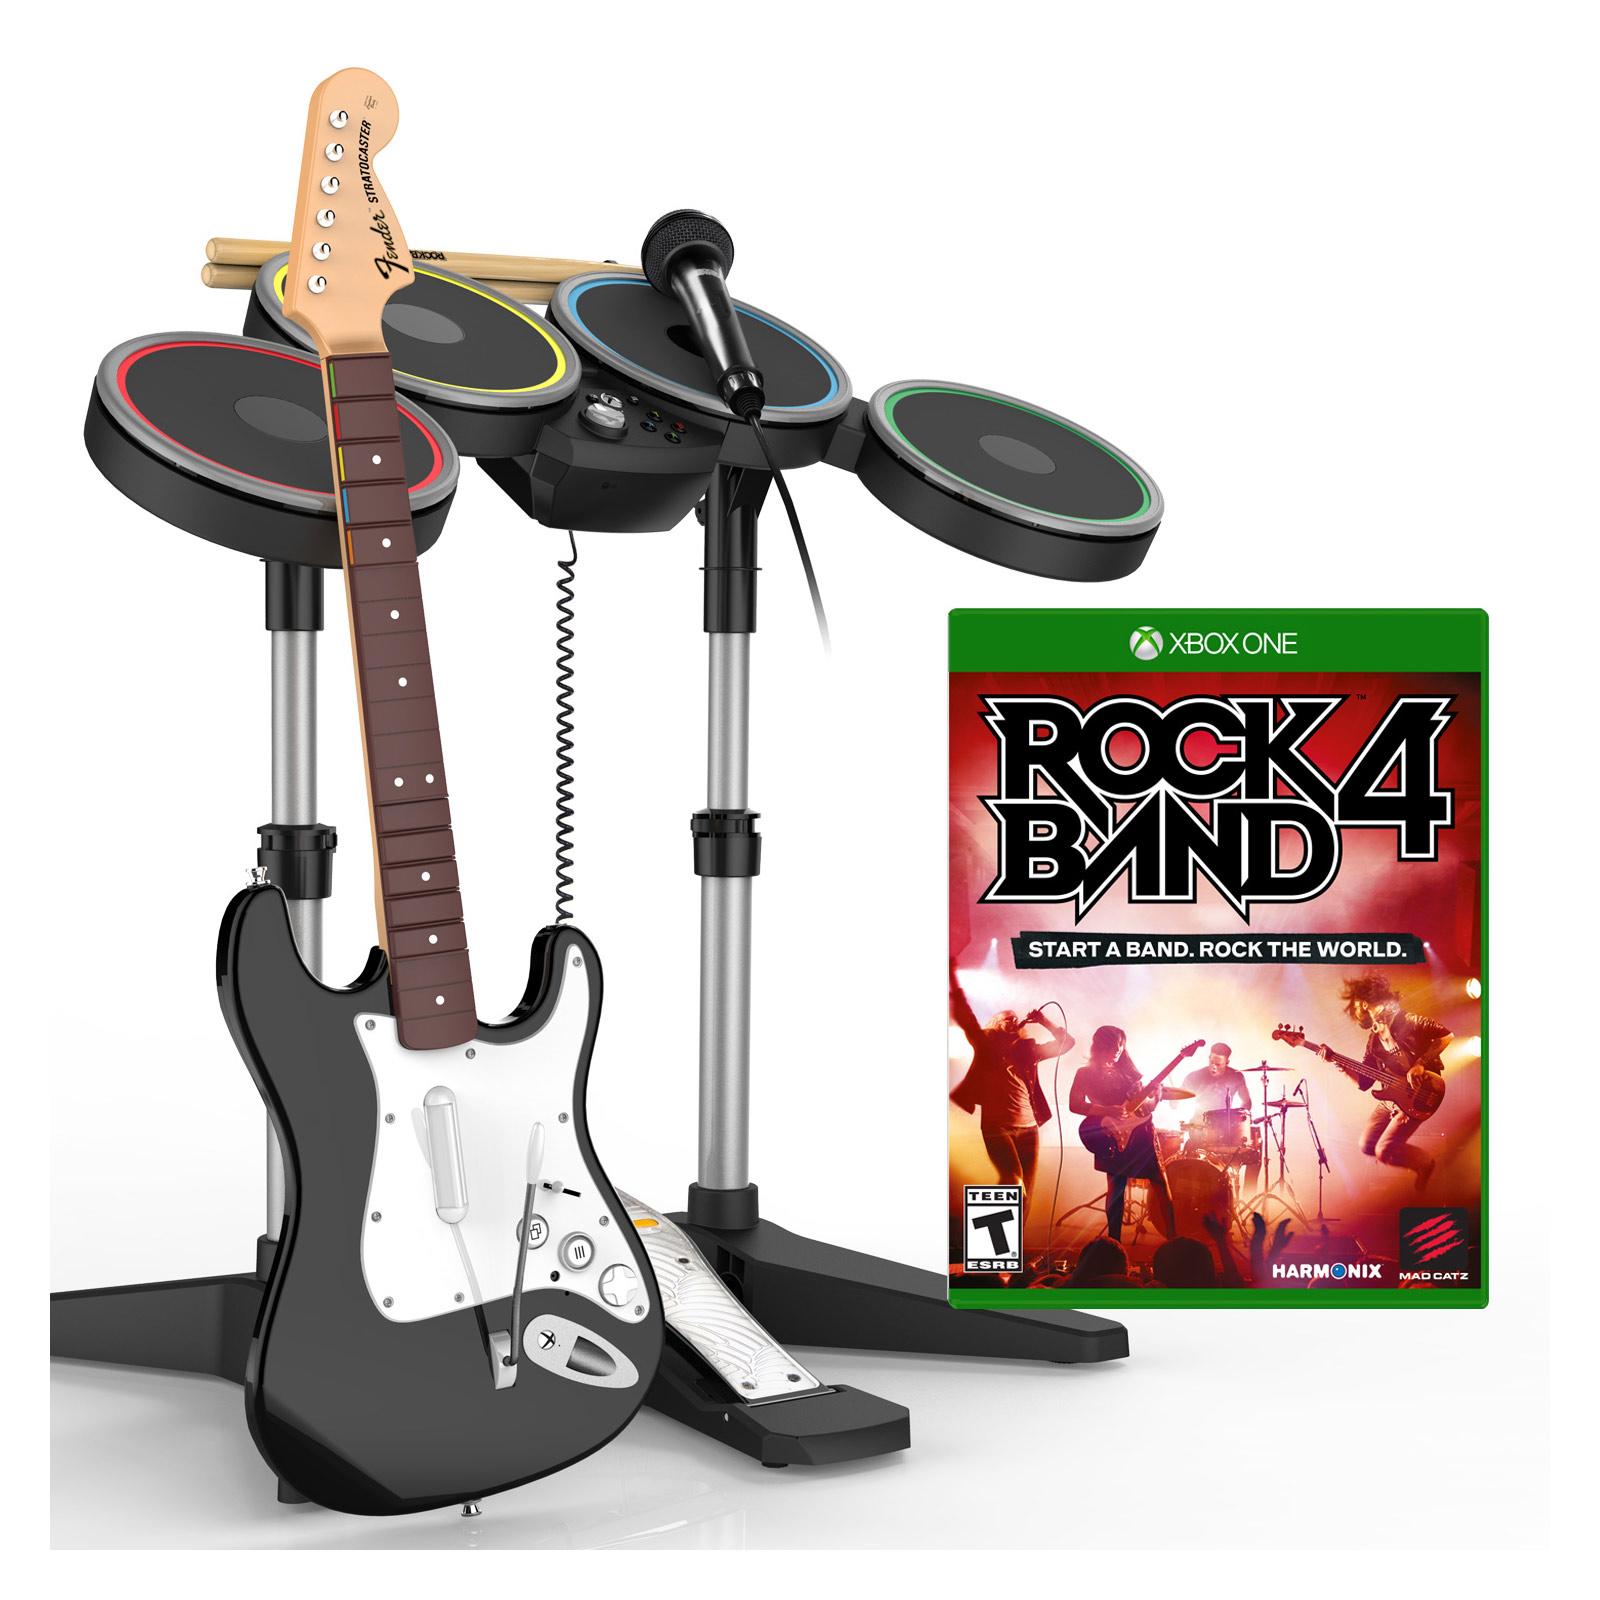 rockband 4 guitare batterie micro xbox one 0728658047597 achat vente jeux xbox one. Black Bedroom Furniture Sets. Home Design Ideas